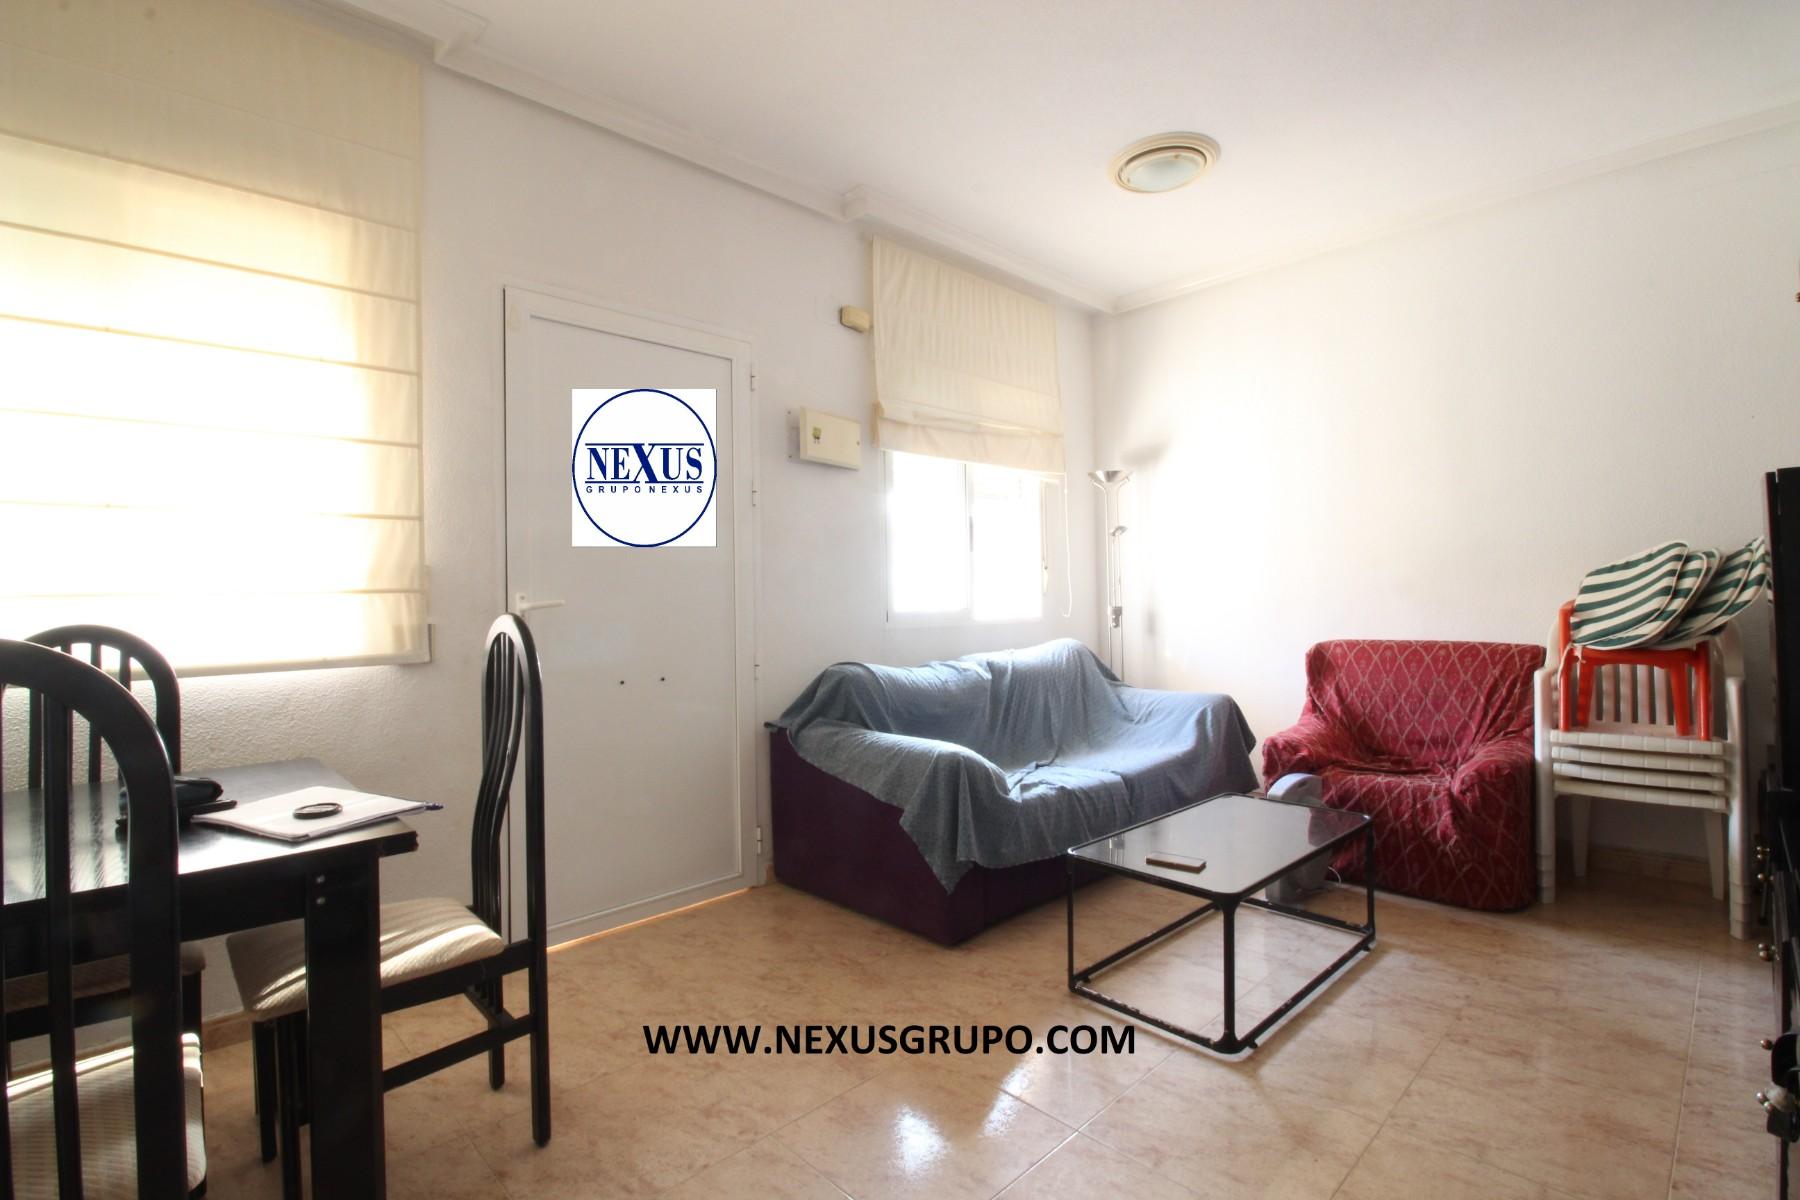 Real Estate Grupo Nexus, Sell Excellent independent villa in Orihuela Costa. in Nexus Grupo